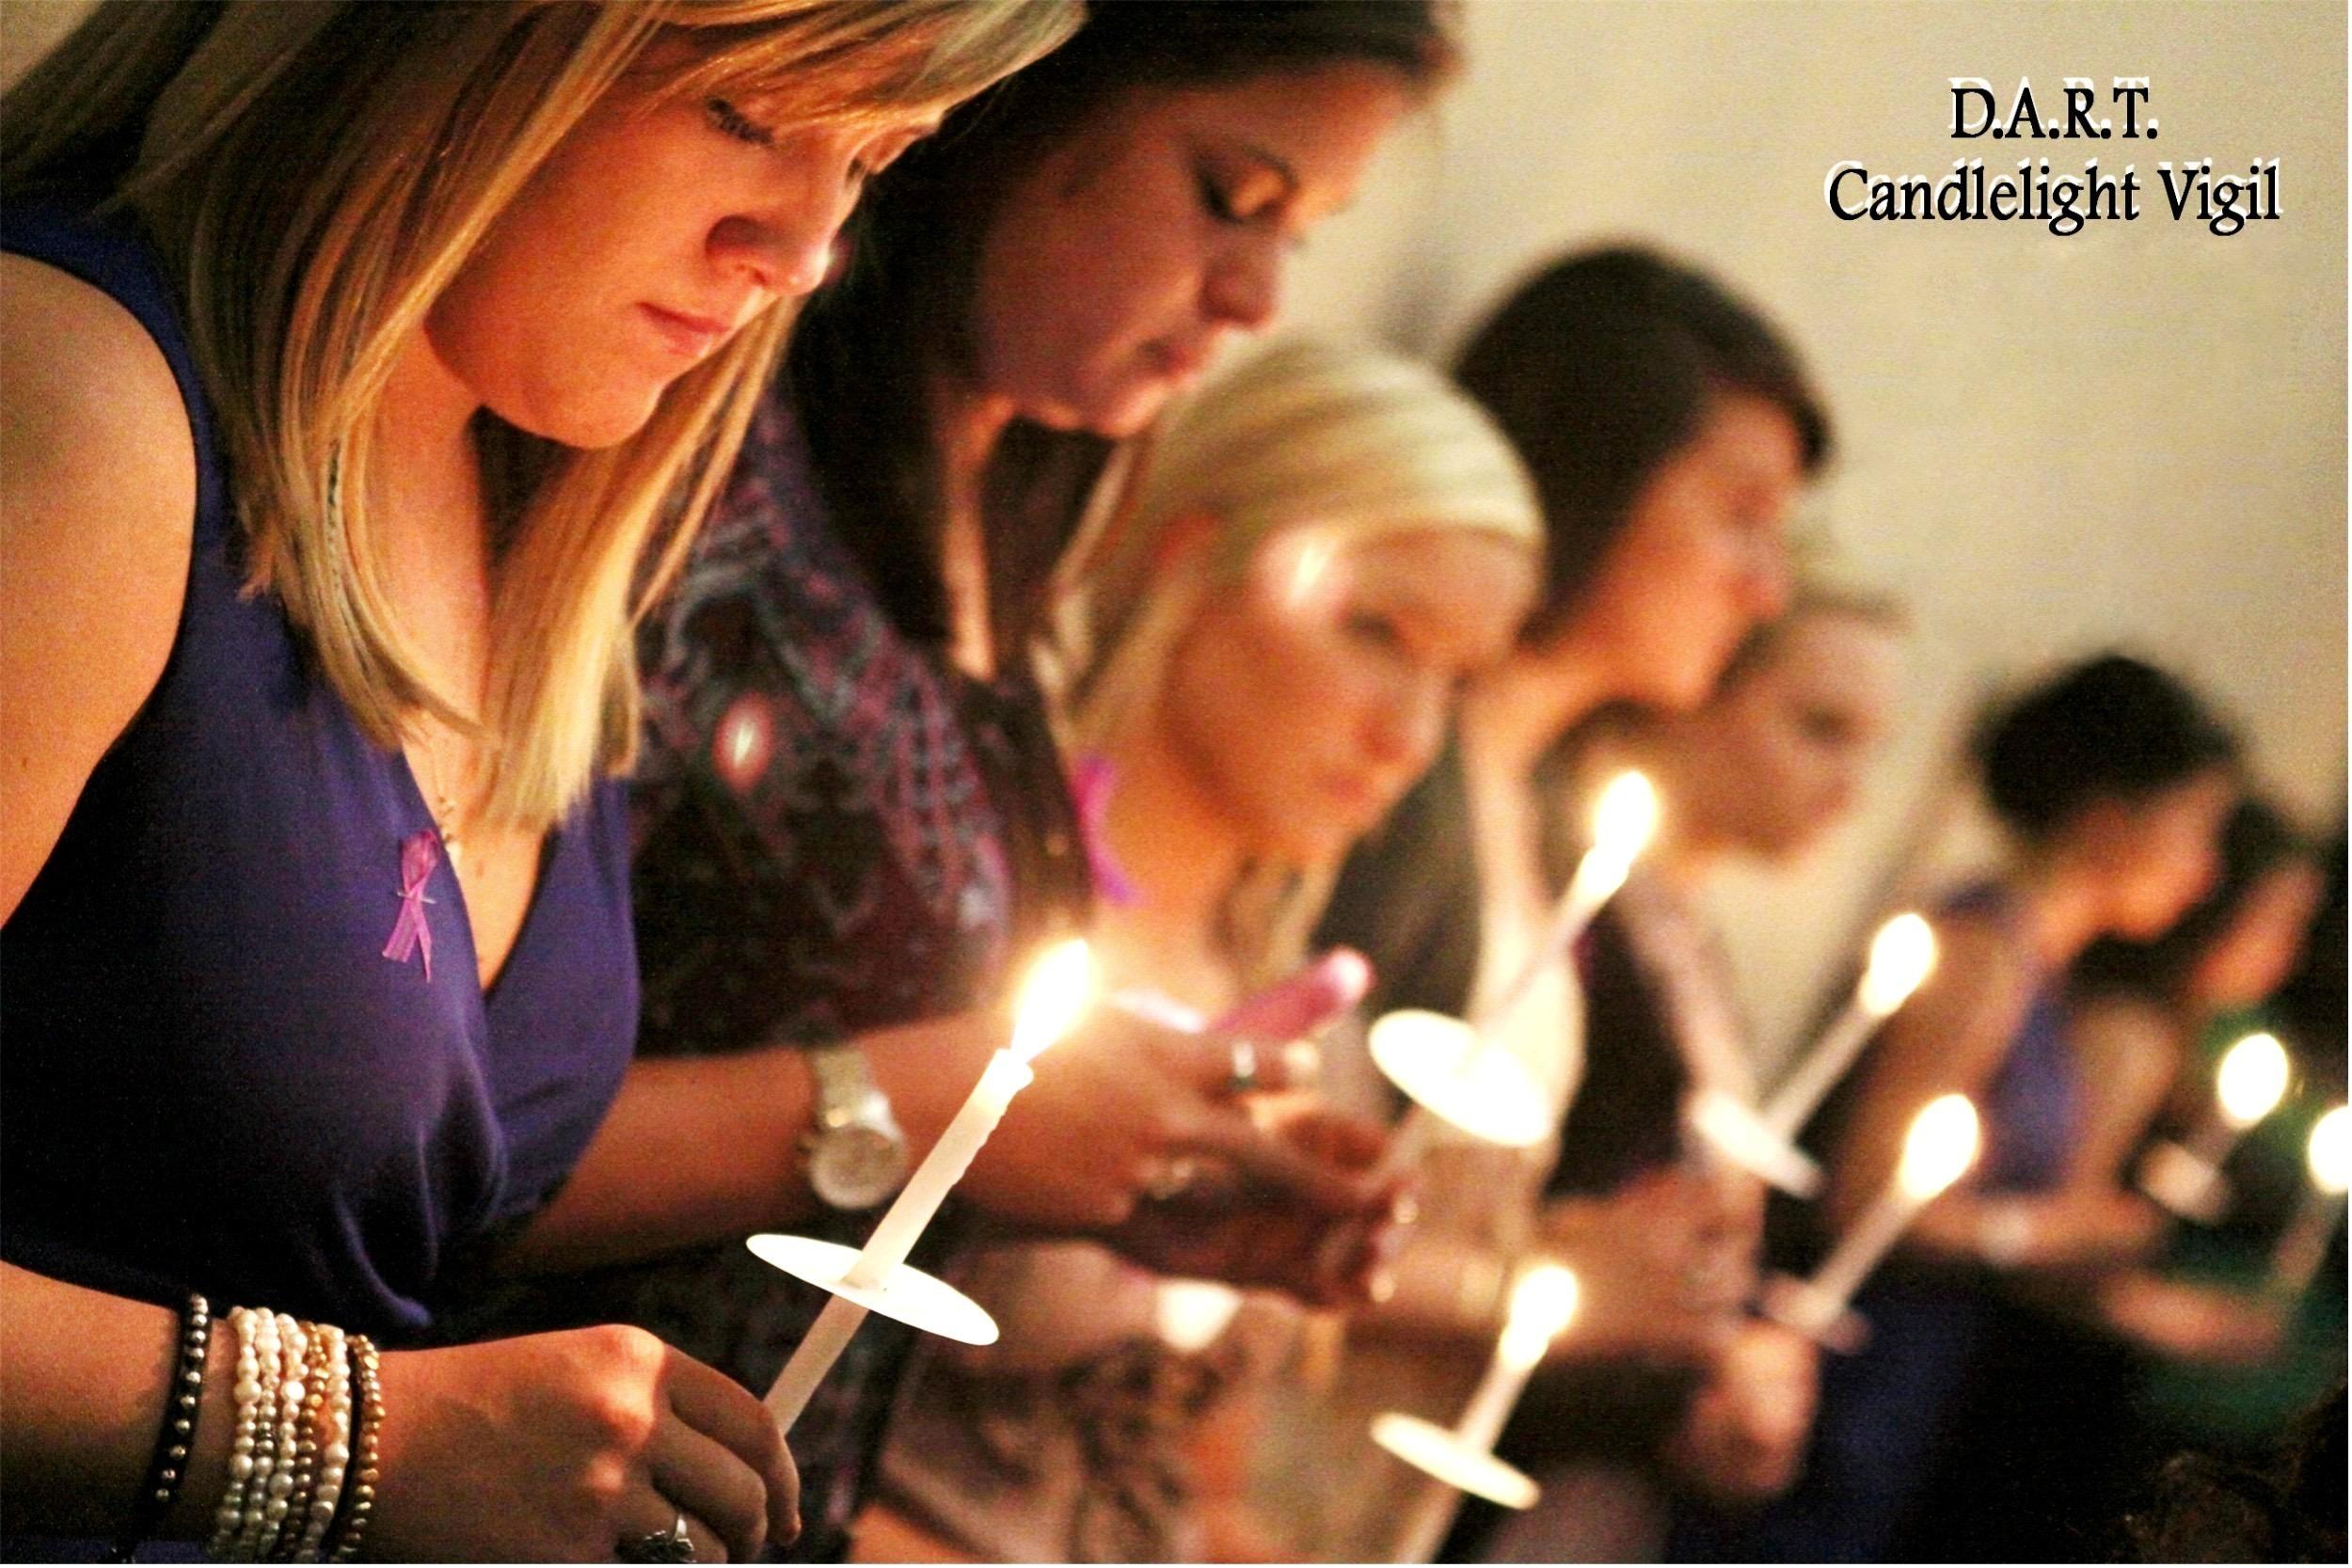 DART Candlelight Vigil - 2011 092a.jpg